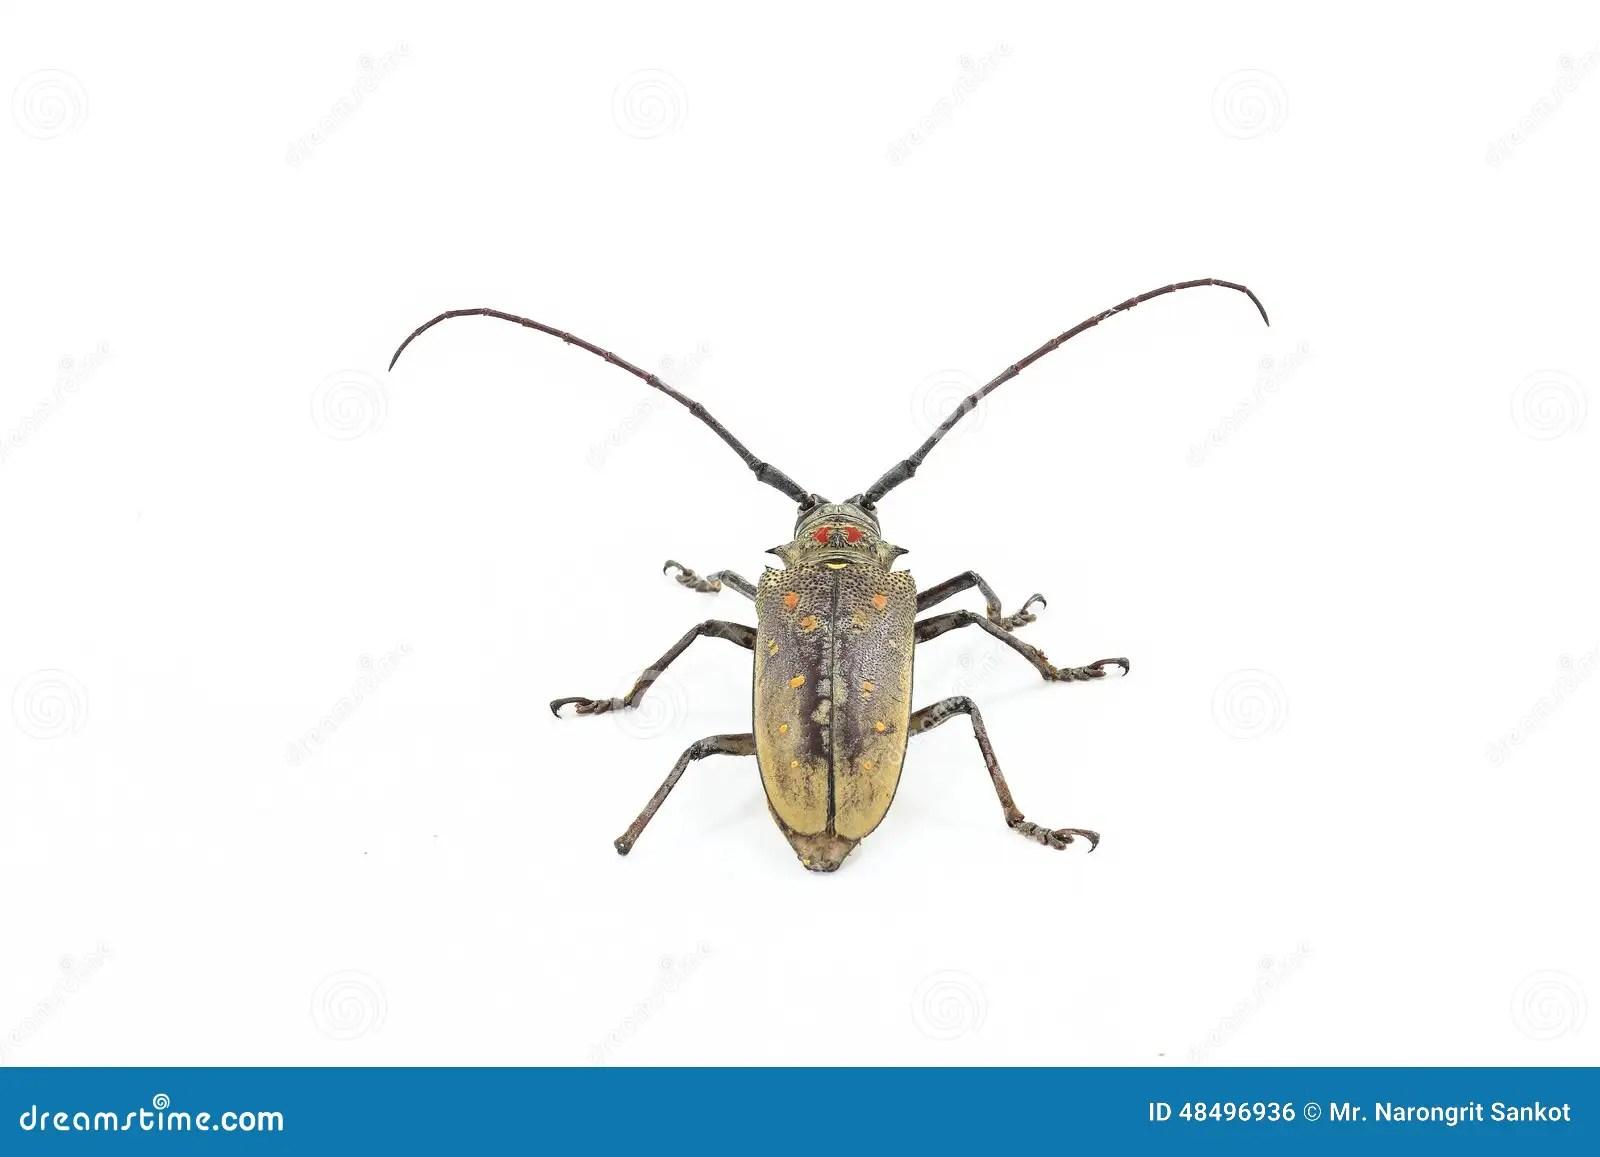 Long Antennae Beetle Stock Photo Image Of Capricorn